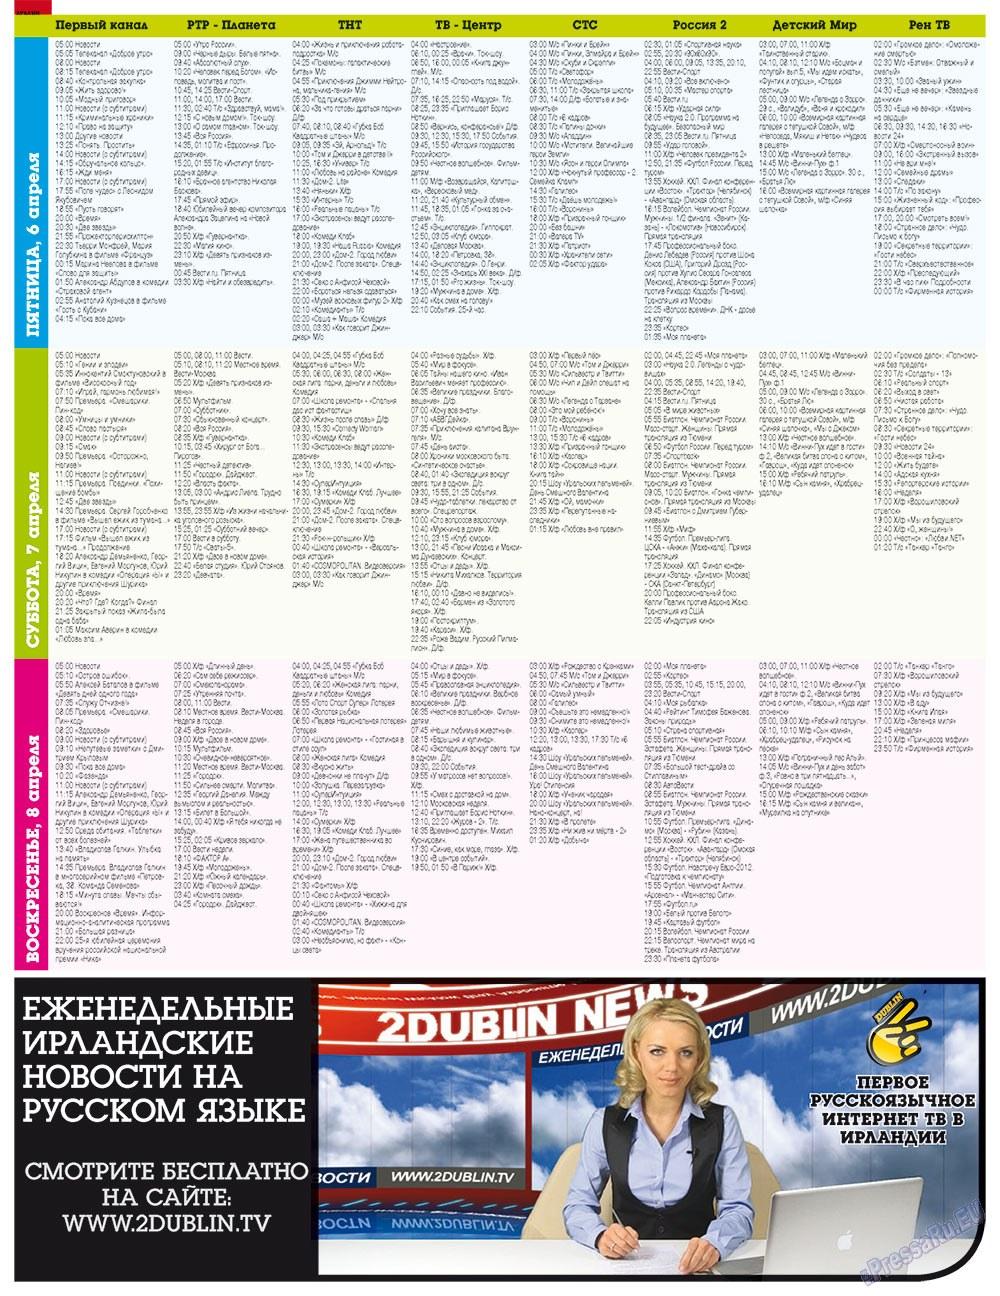 Дублин инфоцентр (газета). 2012 год, номер 12, стр. 9